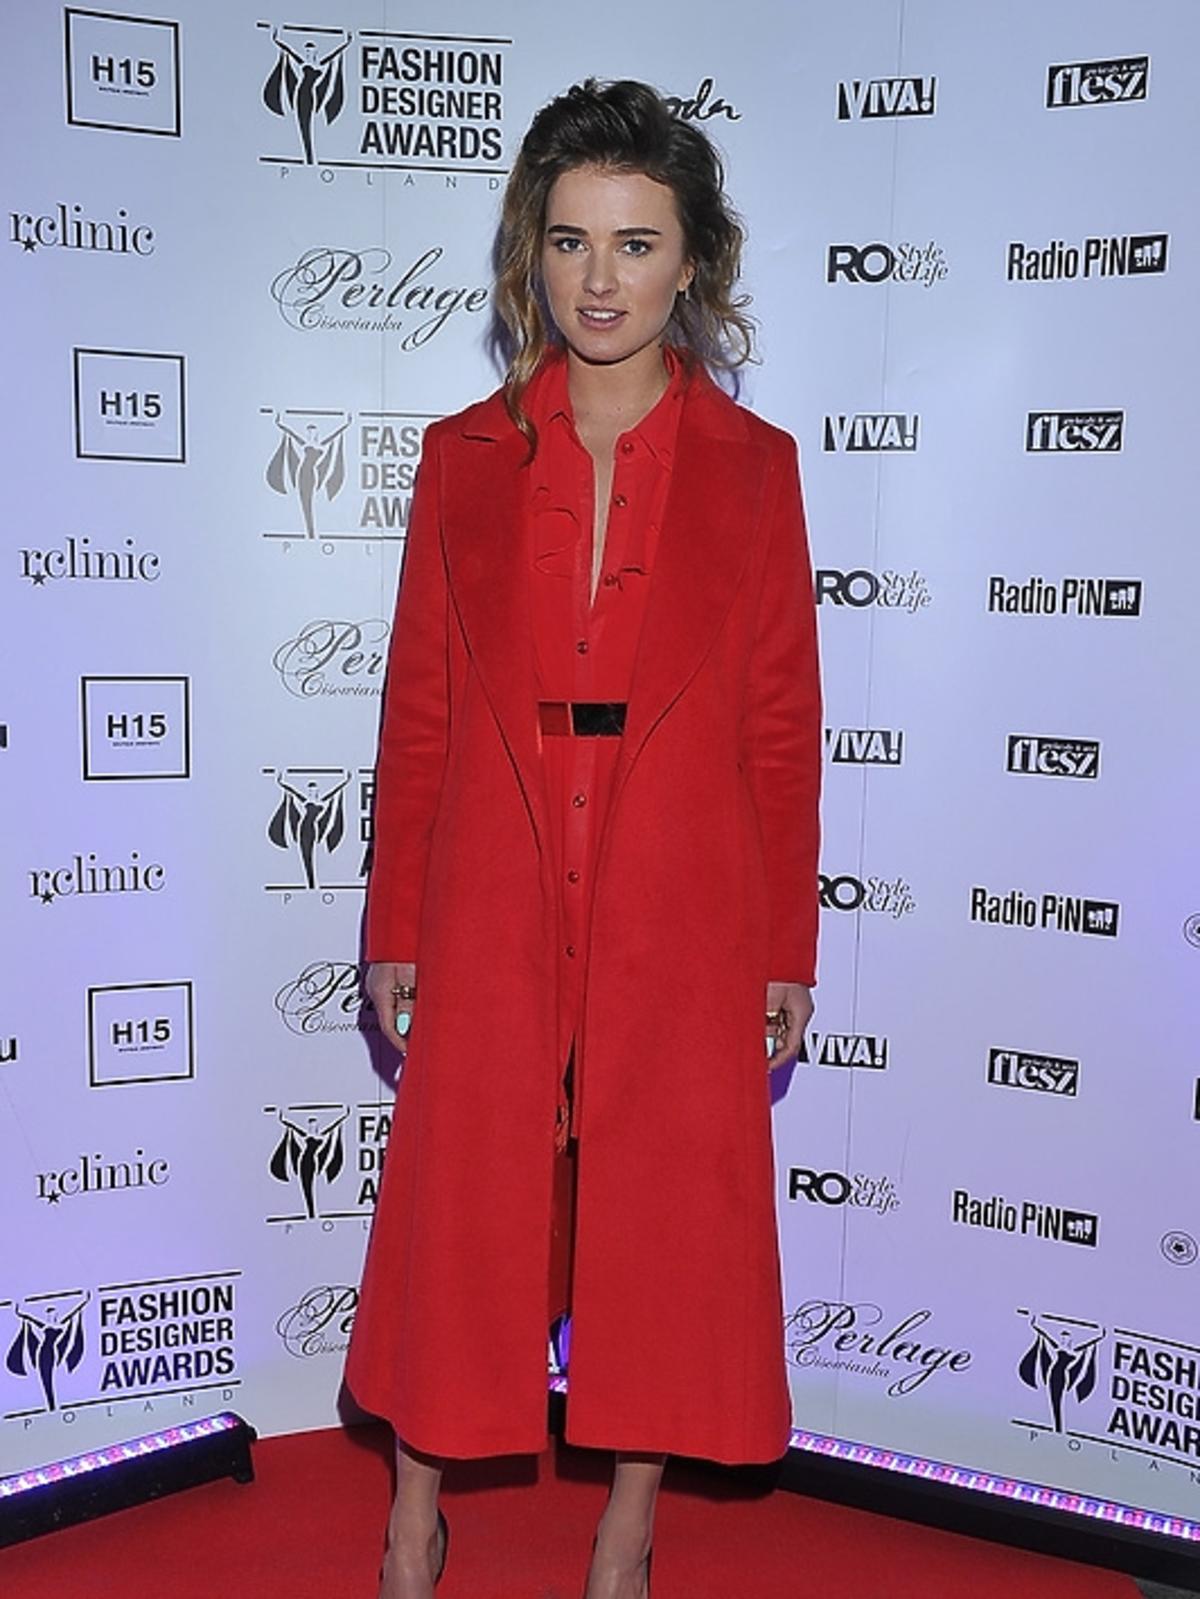 Maffashion (Julia Kuczyńska) na finale Fashion Desinger Awards 2013